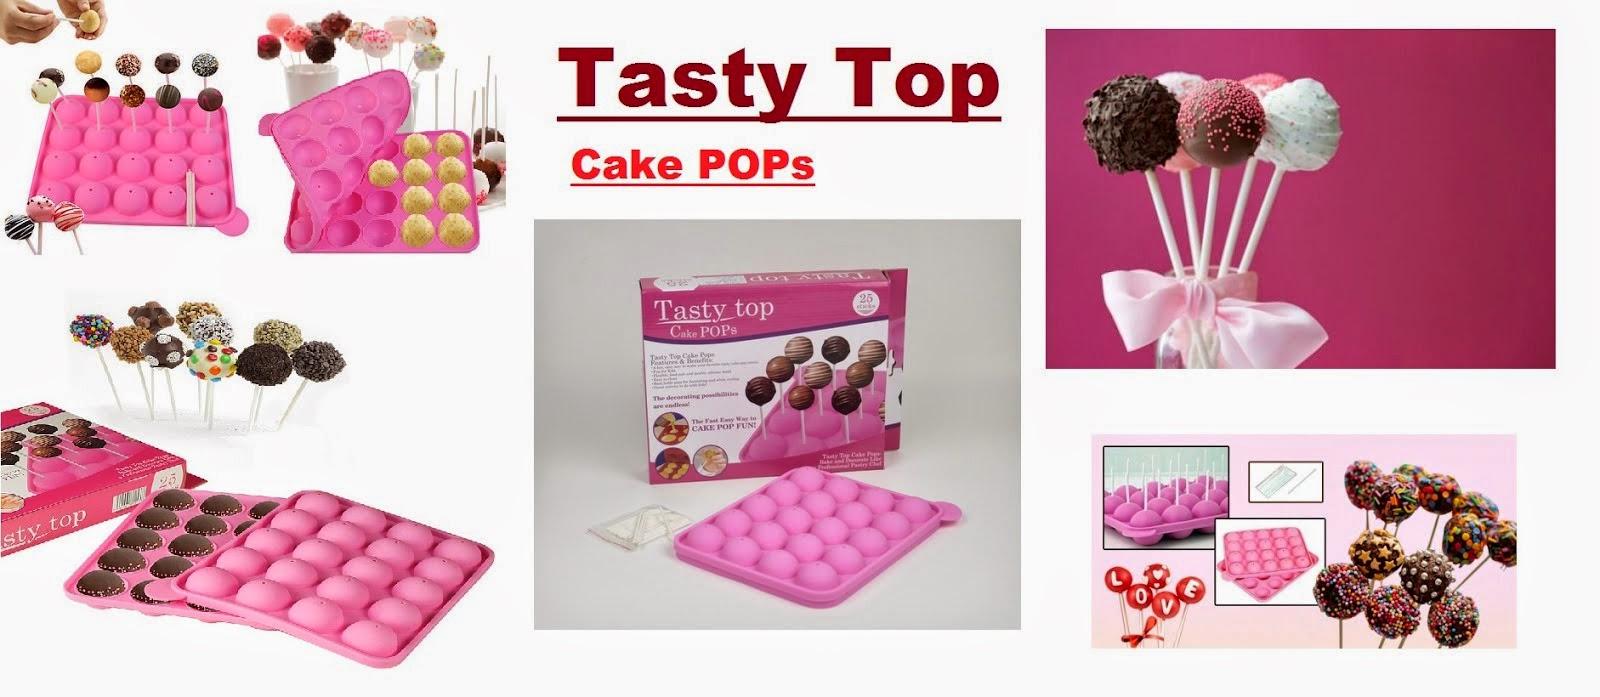 Tasty Top